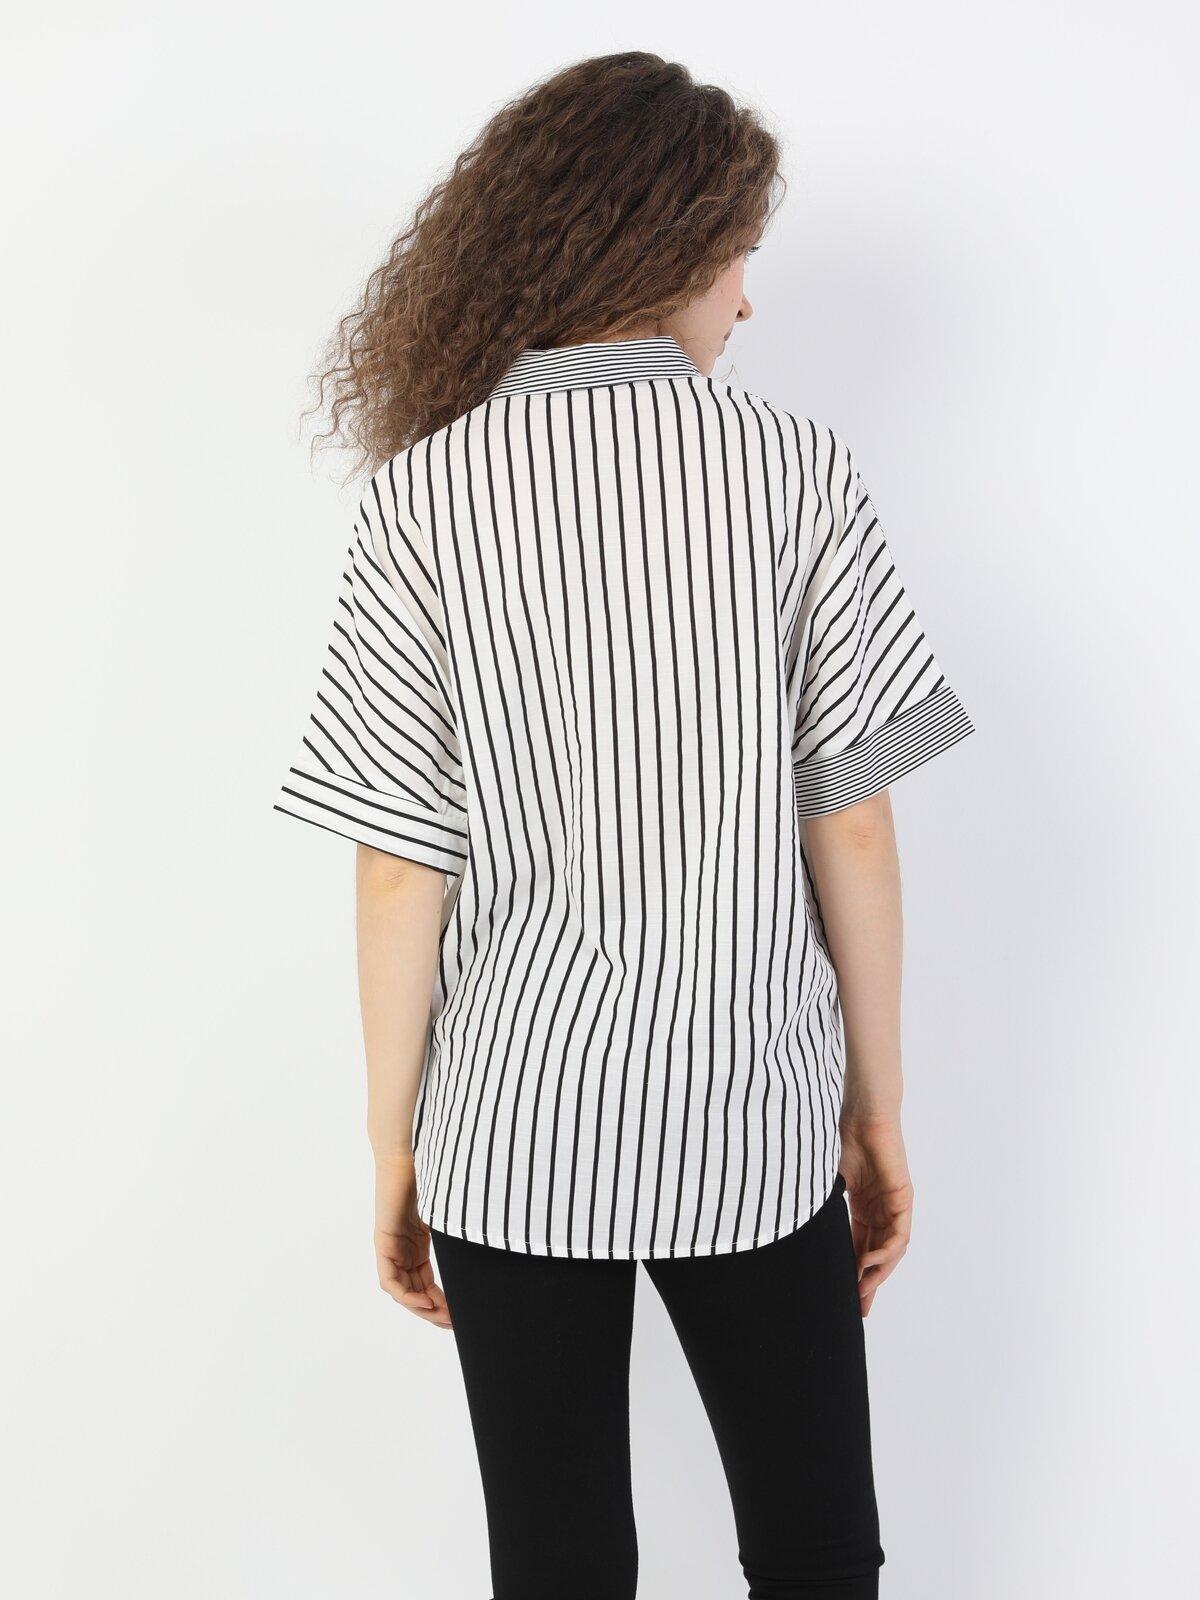 Relaxed Fit Standart Kol V Yaka Siyah Kadın Gömlek Kısa Kol